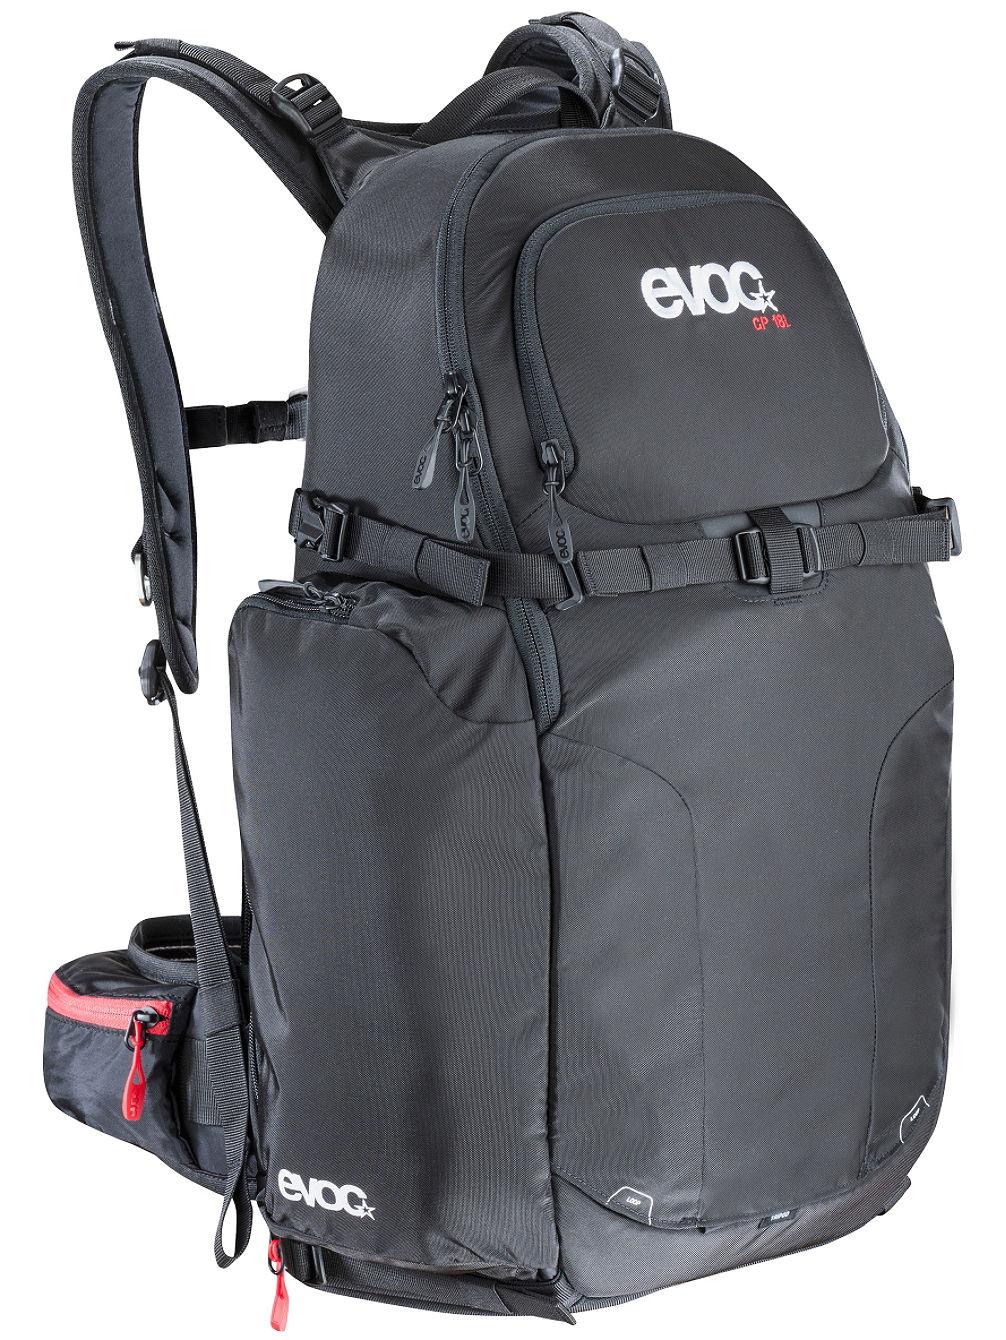 Evoc Camera 18L Backpack Nero- evoc - blue-tomato.com